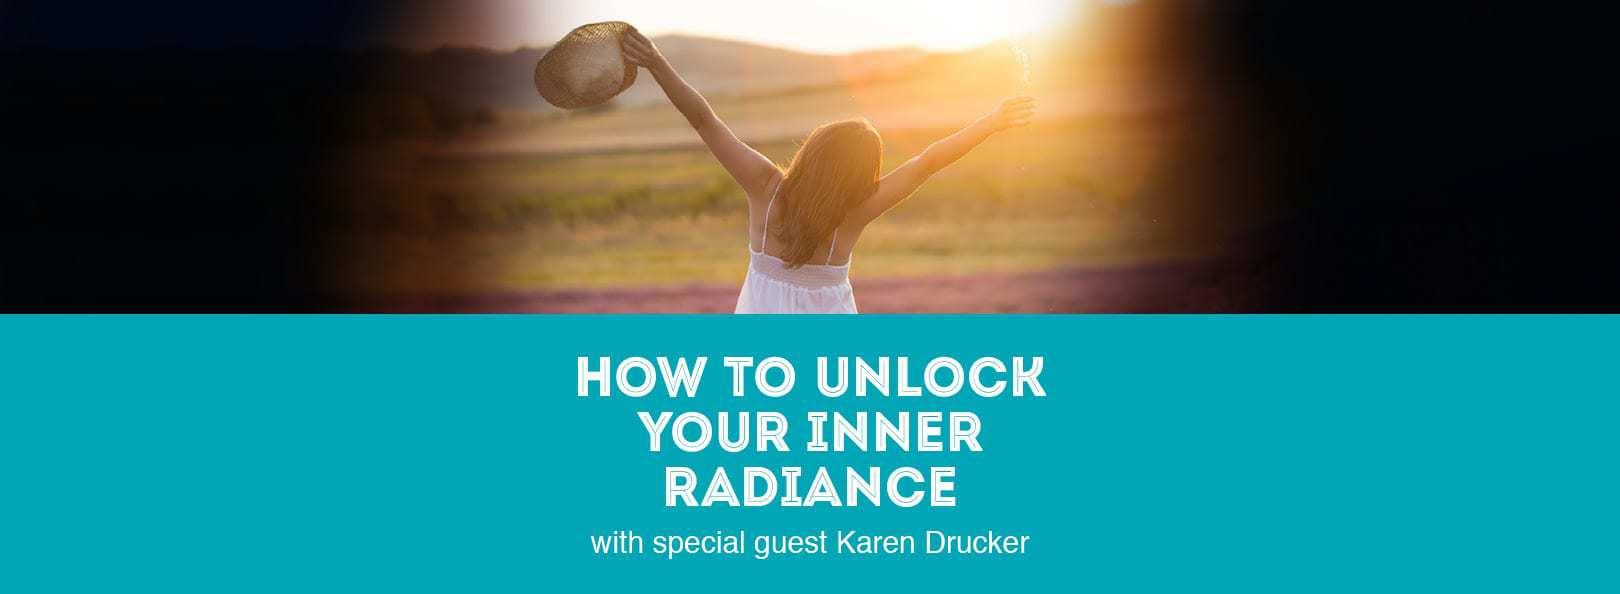 How to Unlock Your Inner Radiance with special guest Karen Drucker